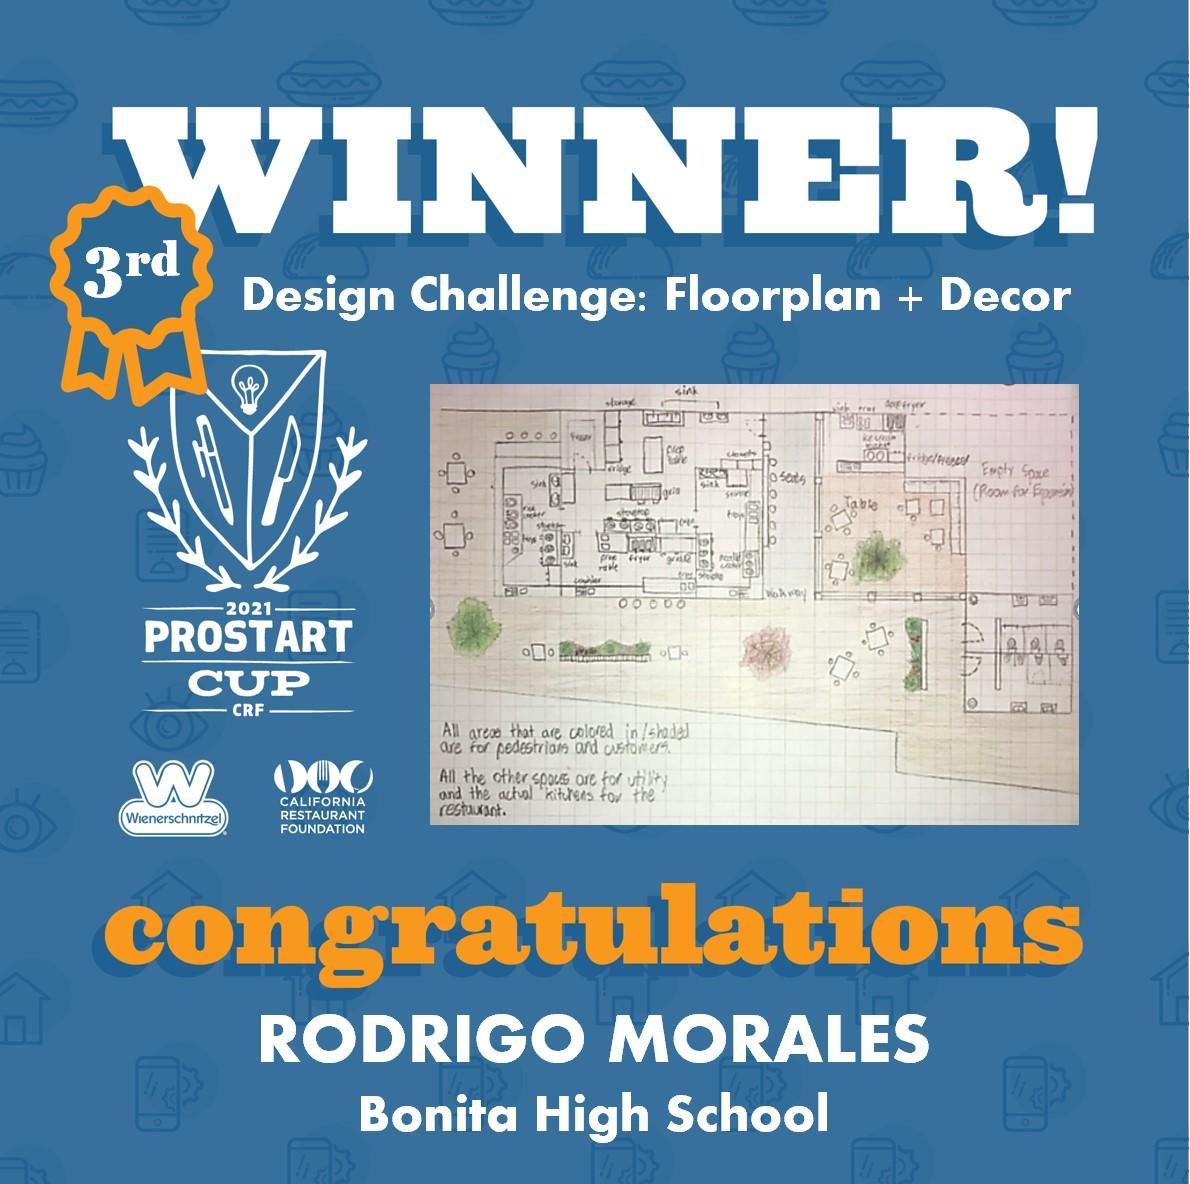 2021 ProStart Winner - Design Challenge: Floorplan + Décor - 3rd Place